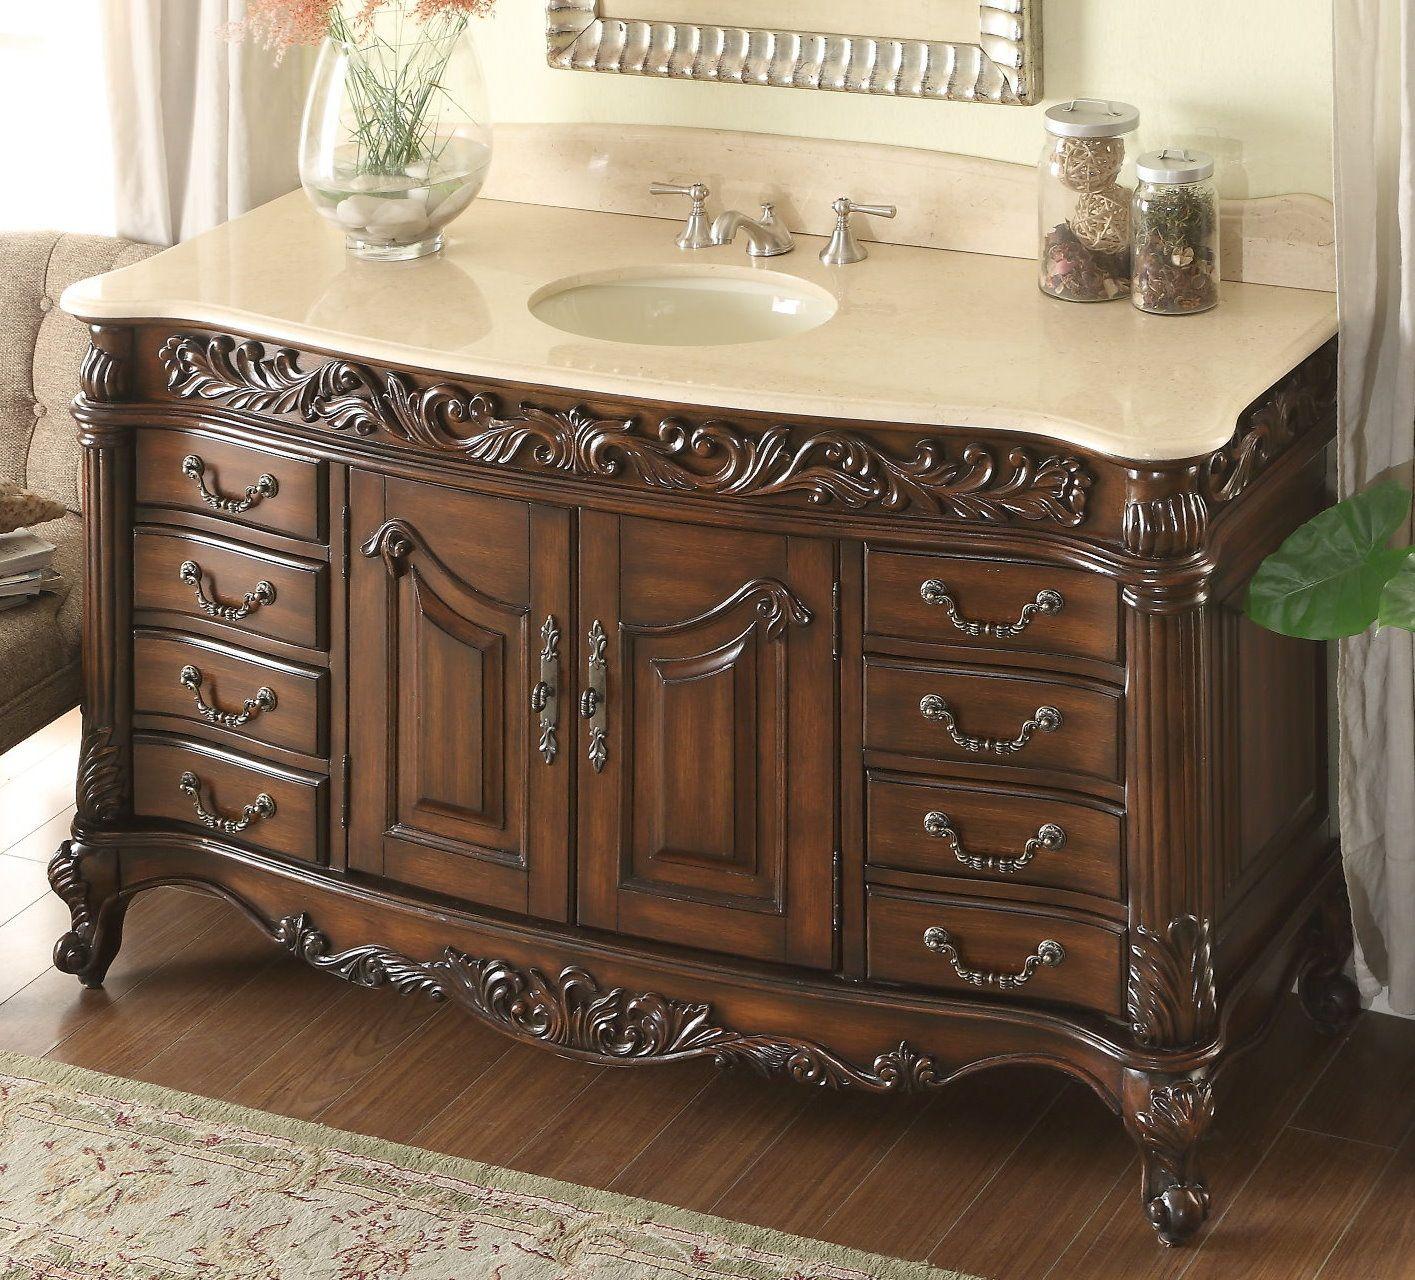 Adelina 60 Inch Antique Bathroom Vanity Beveled Edges Marble Top